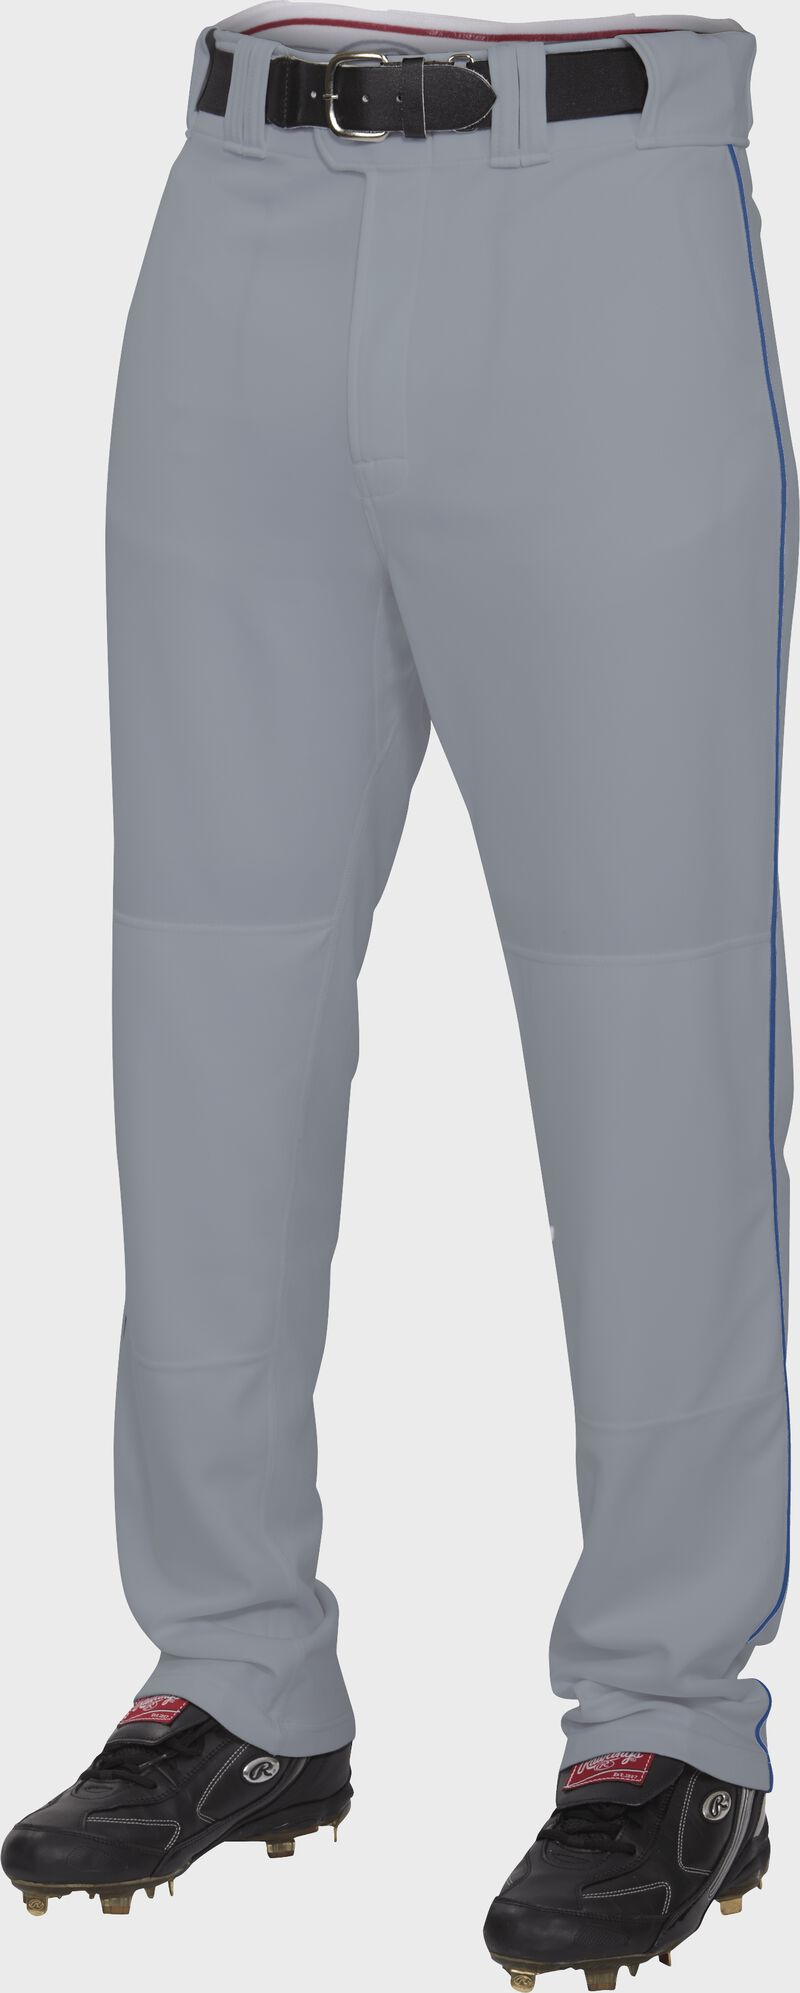 Front of Rawlings Blue Gray/Royal Youth Semi-Relaxed Piped Pant - SKU #YPRO150P-BG/DG-90